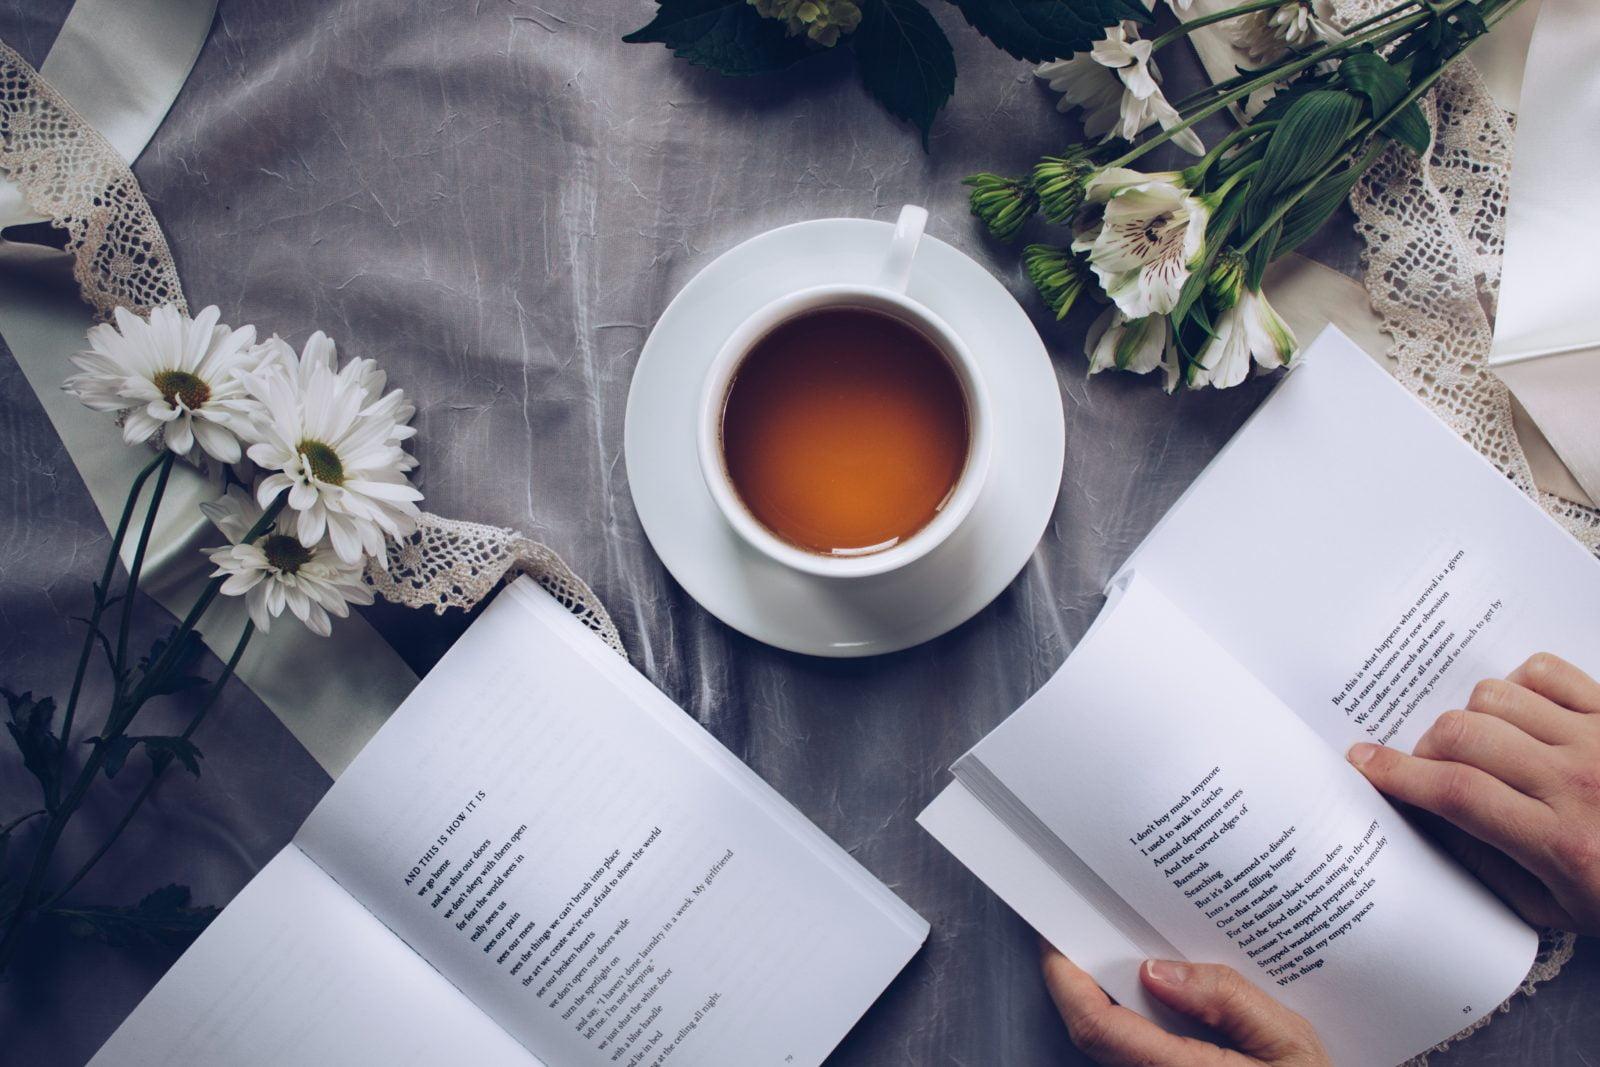 Kitaplarla Terapi ve Şifa: Bibliyoterapi